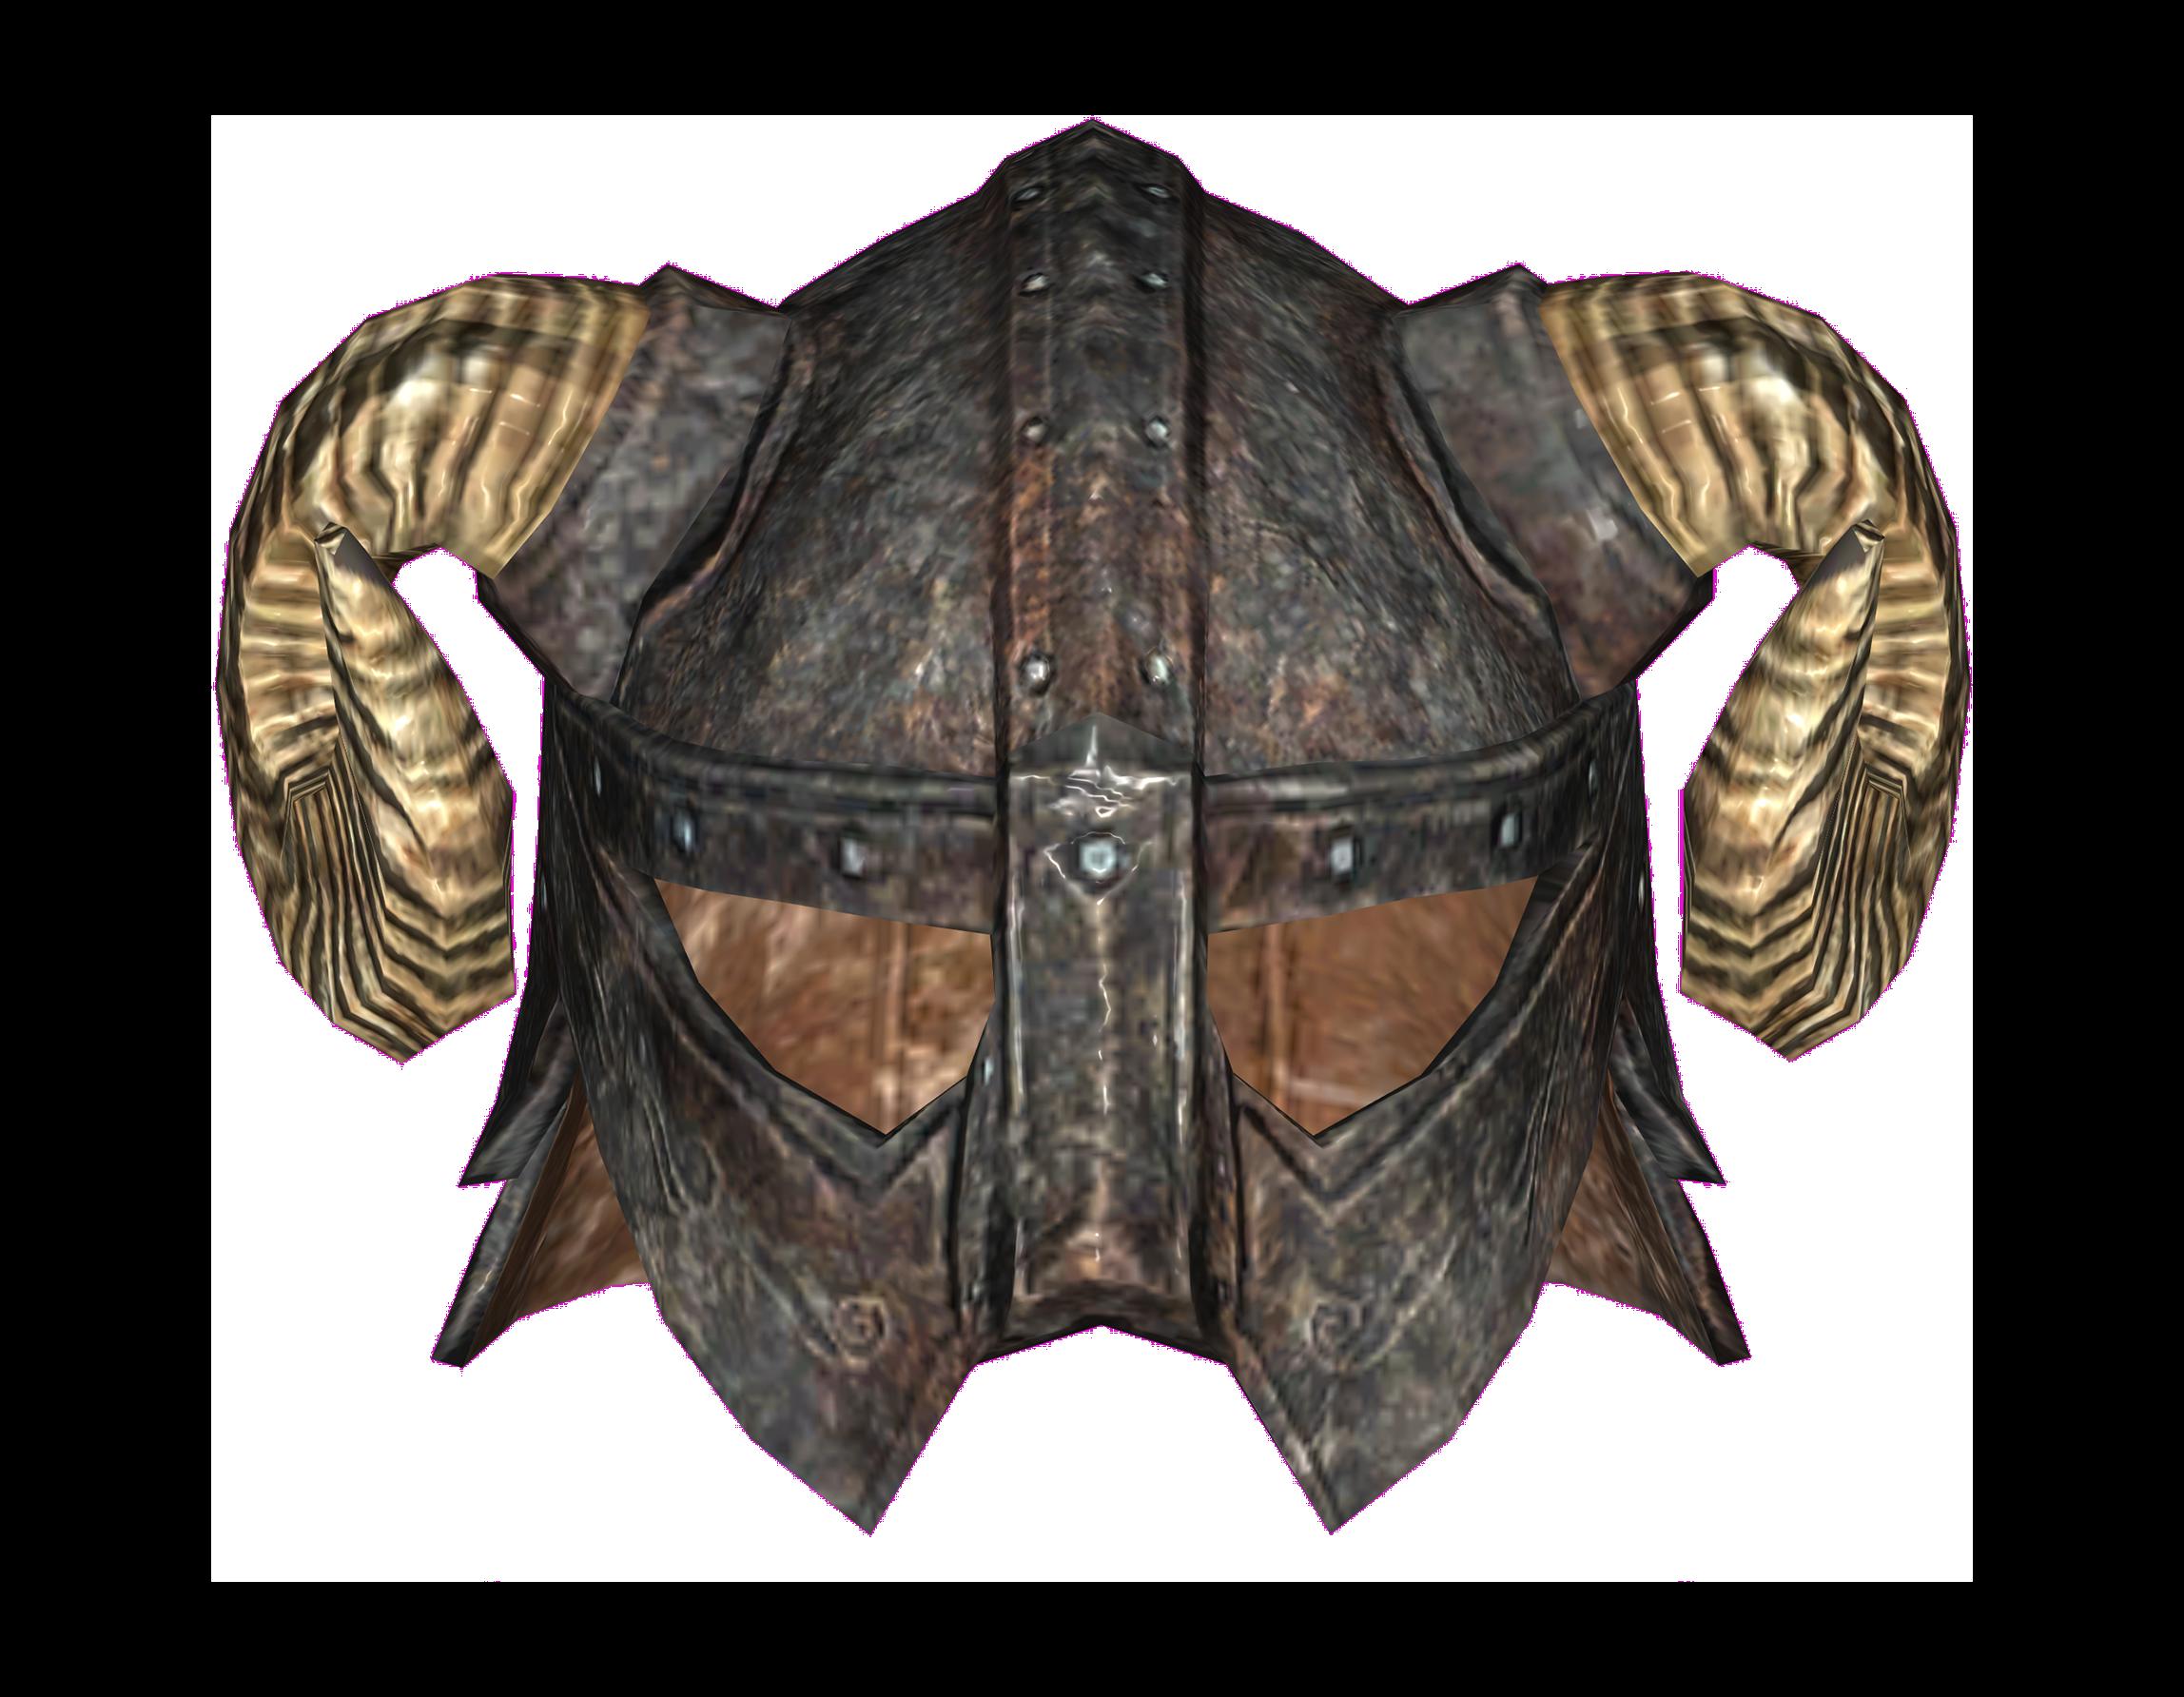 Skyrim helmet png. Image iron female elder